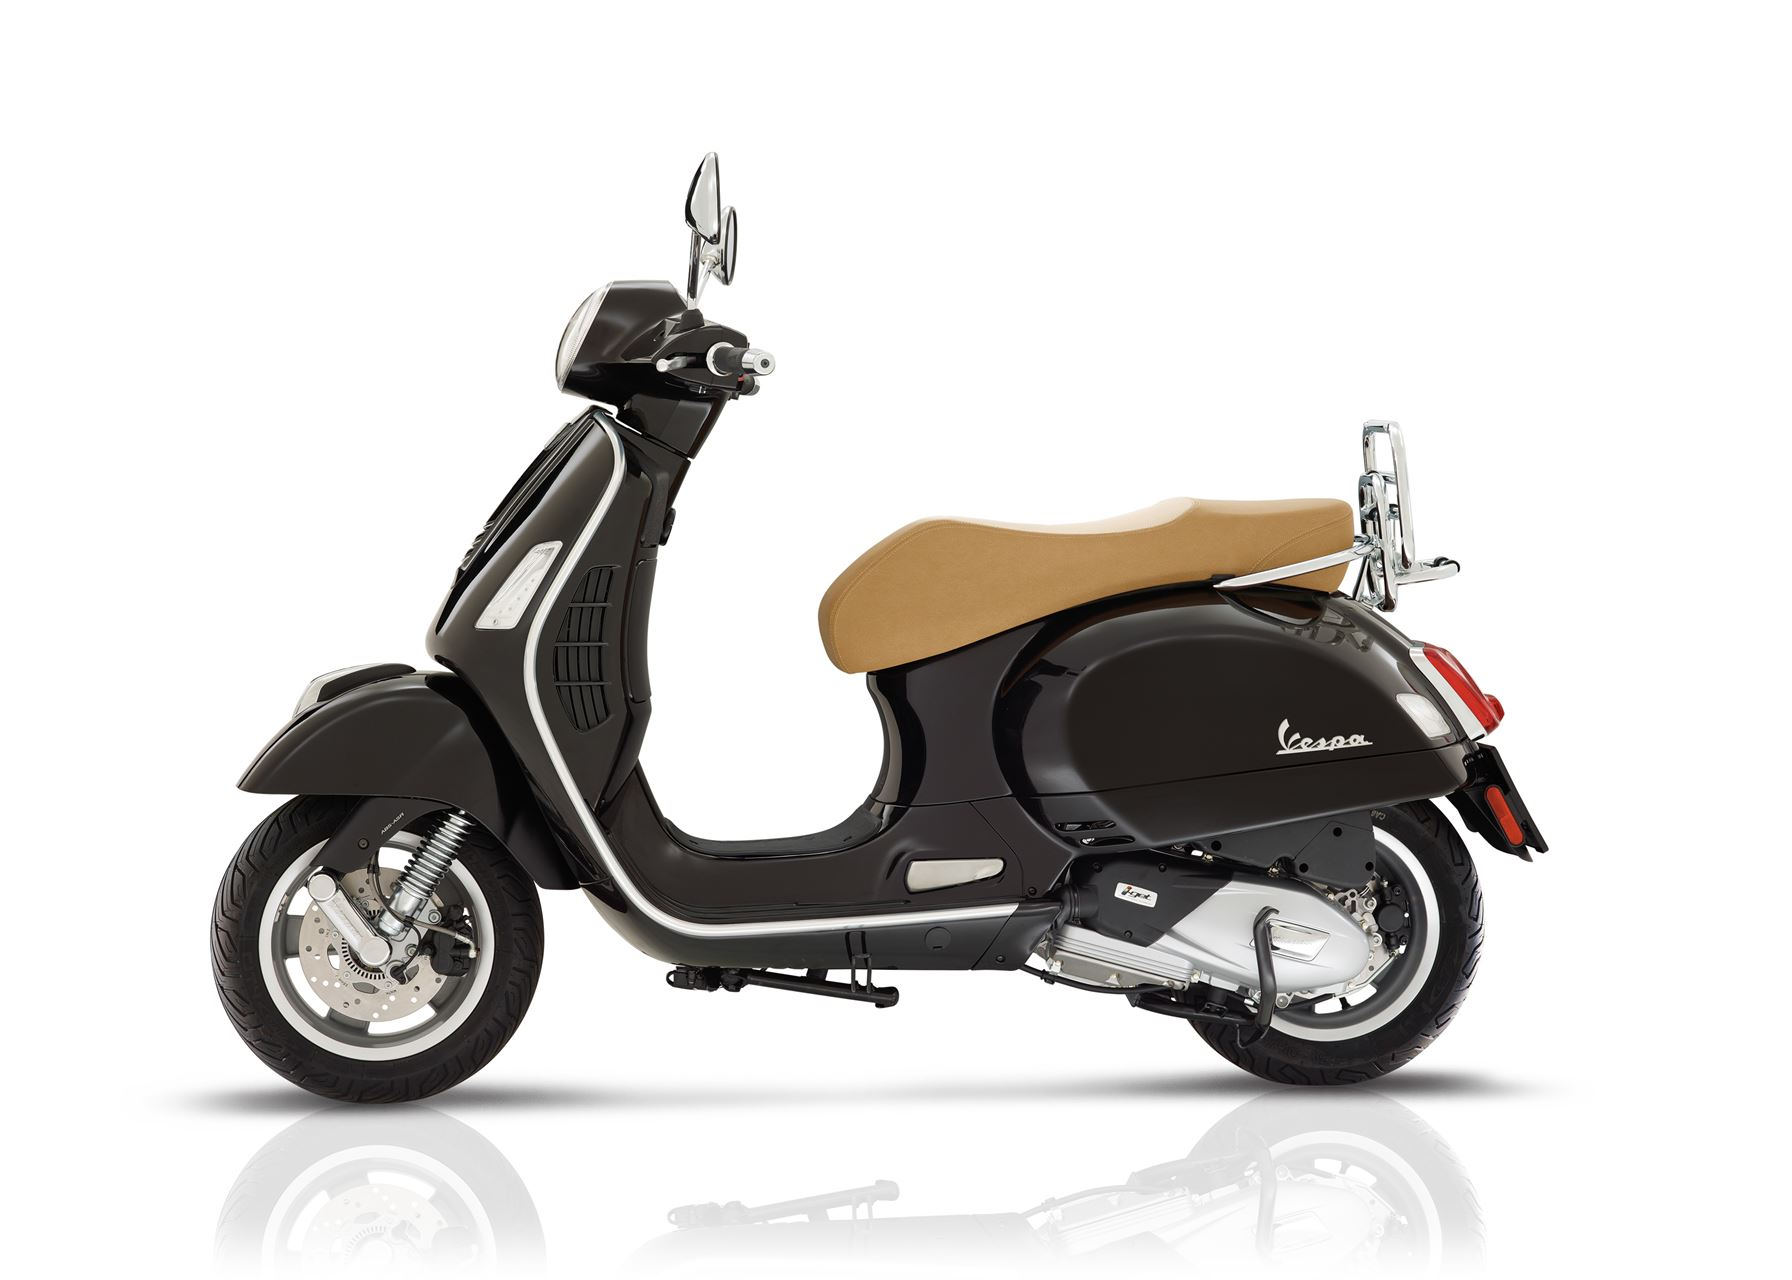 vespa gts 125 scooter gama 125cc lombas e curvas. Black Bedroom Furniture Sets. Home Design Ideas